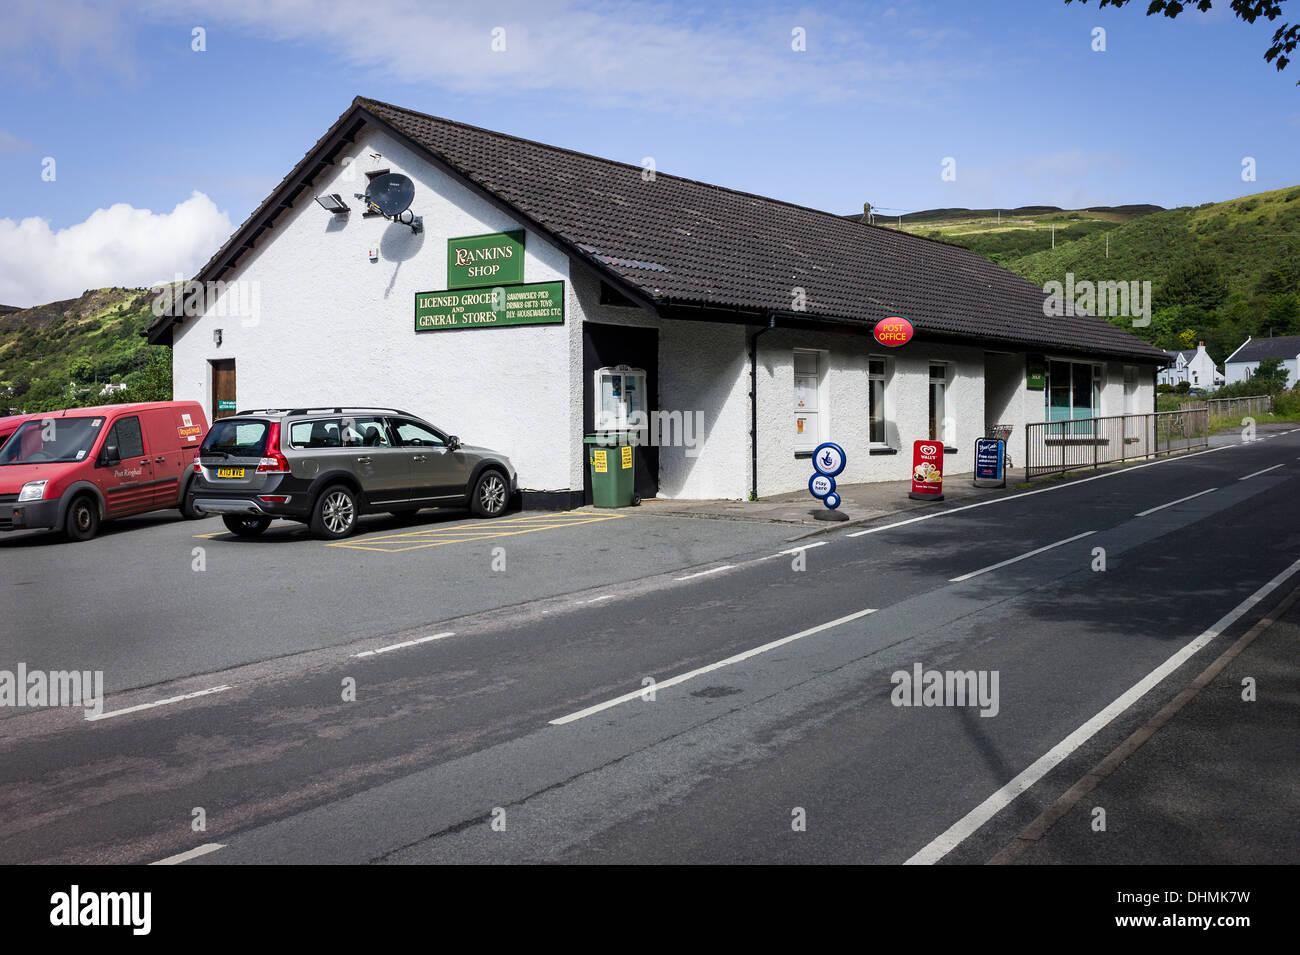 Rankins village general store in Uig Skye Scotland UK EU - Stock Image